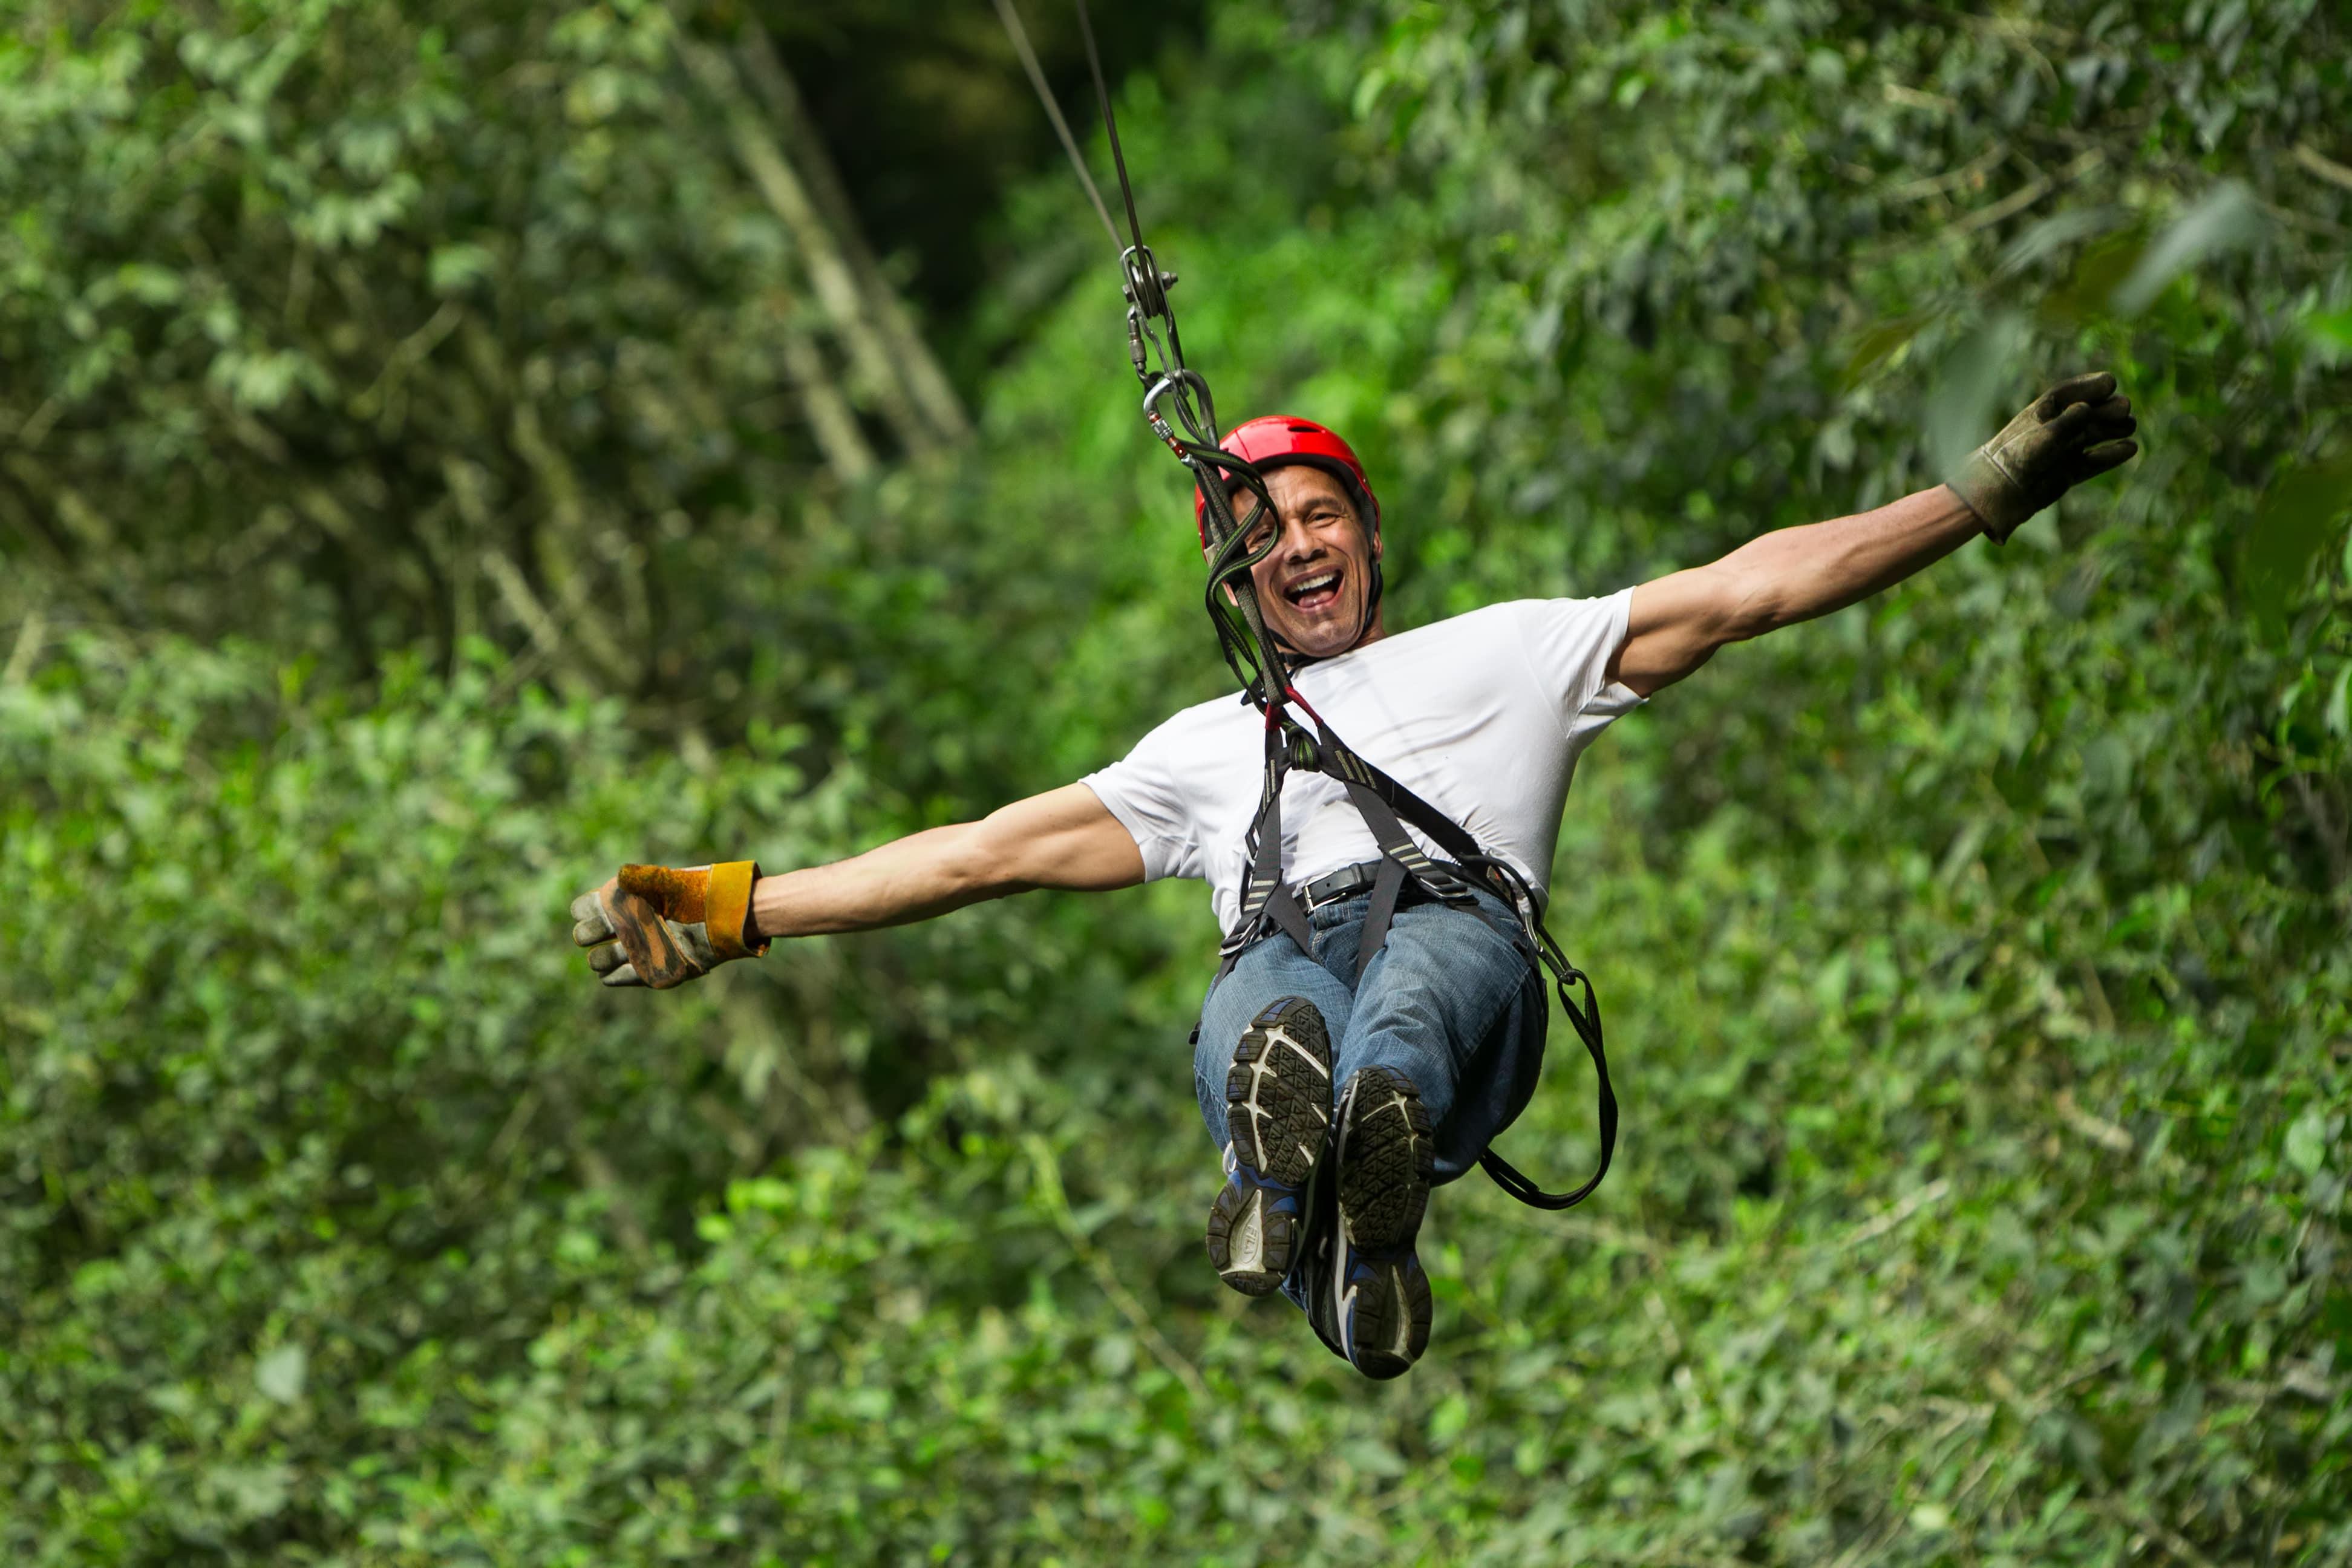 Zipline to Jump Start of Canyoneering at Badian Cebu